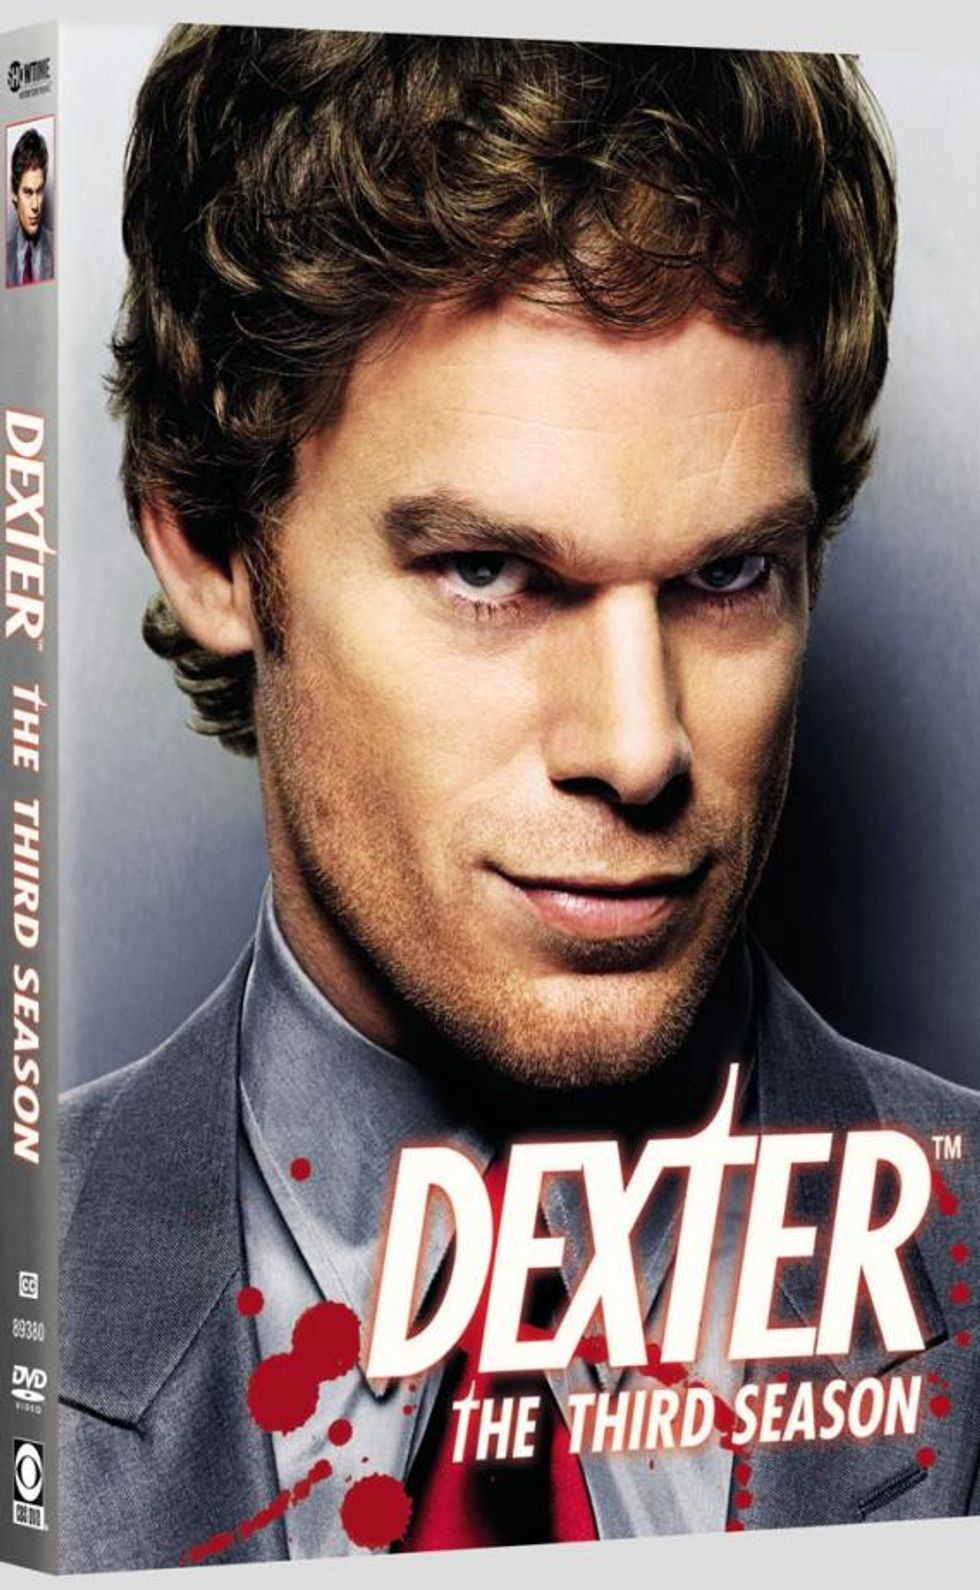 Dexter: The Third Season!